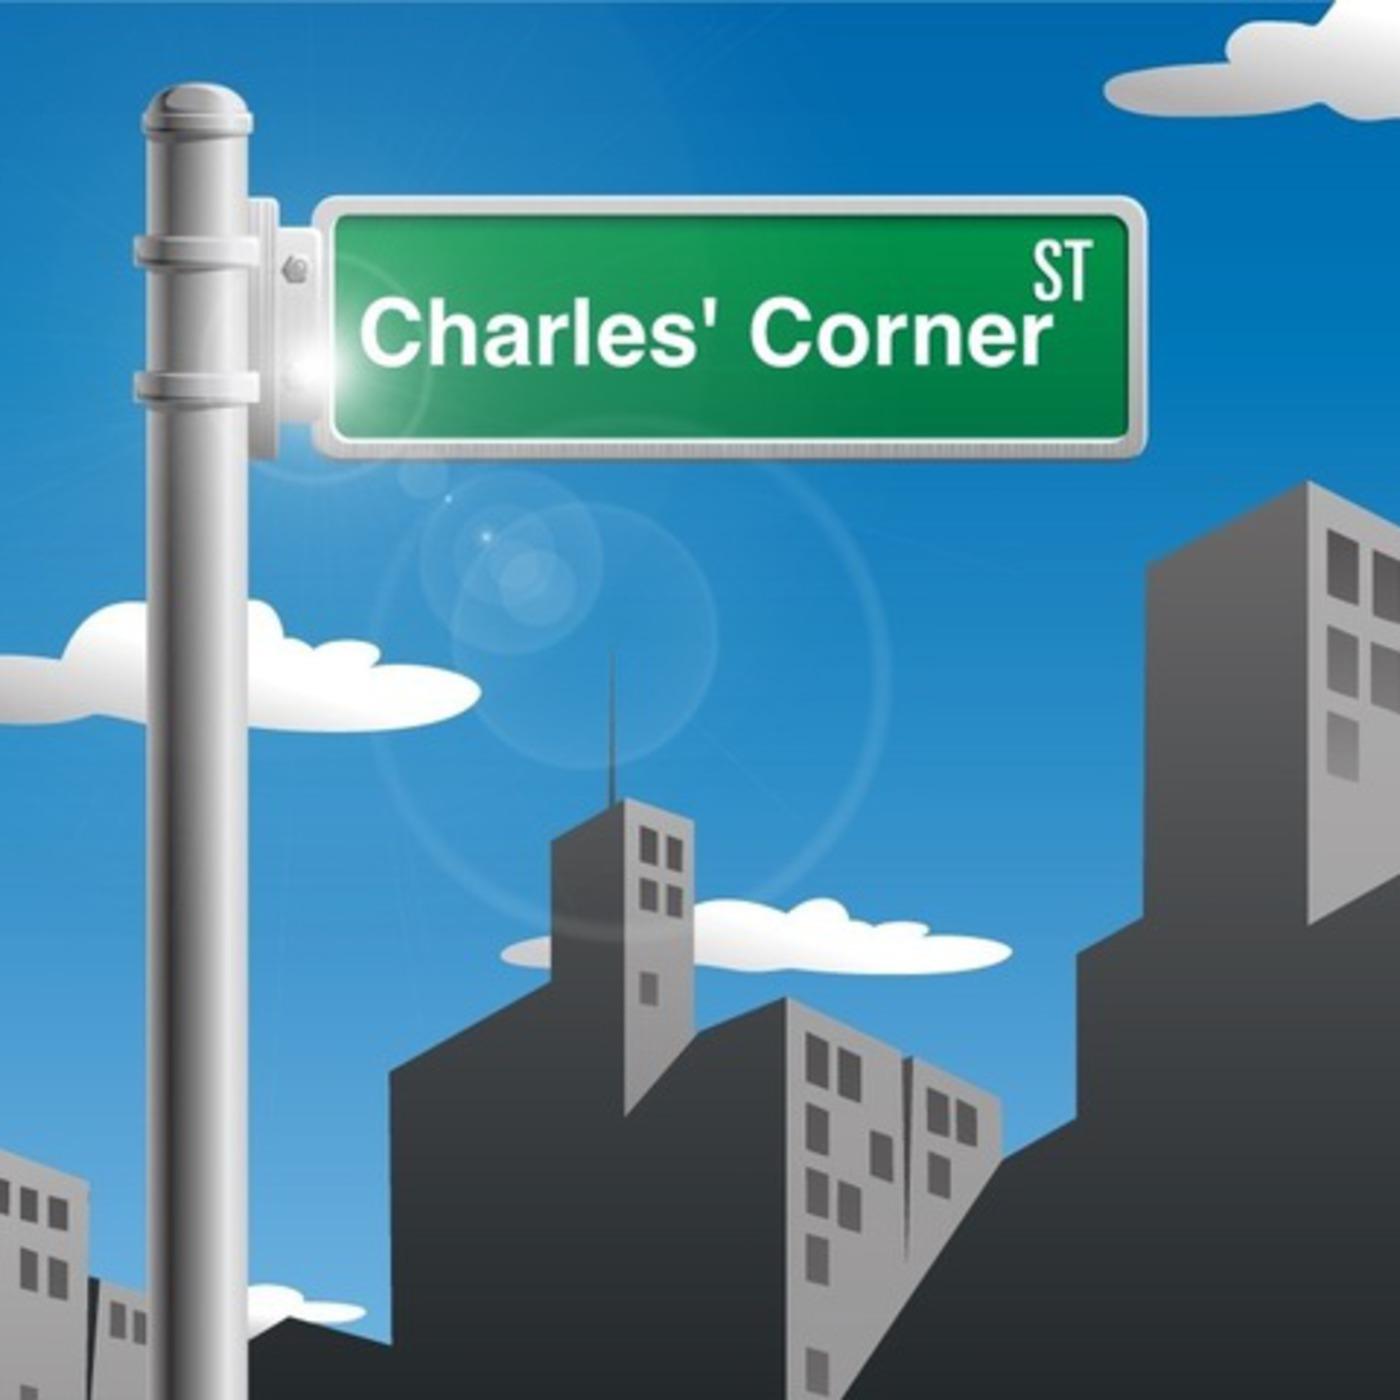 Charles' Corner